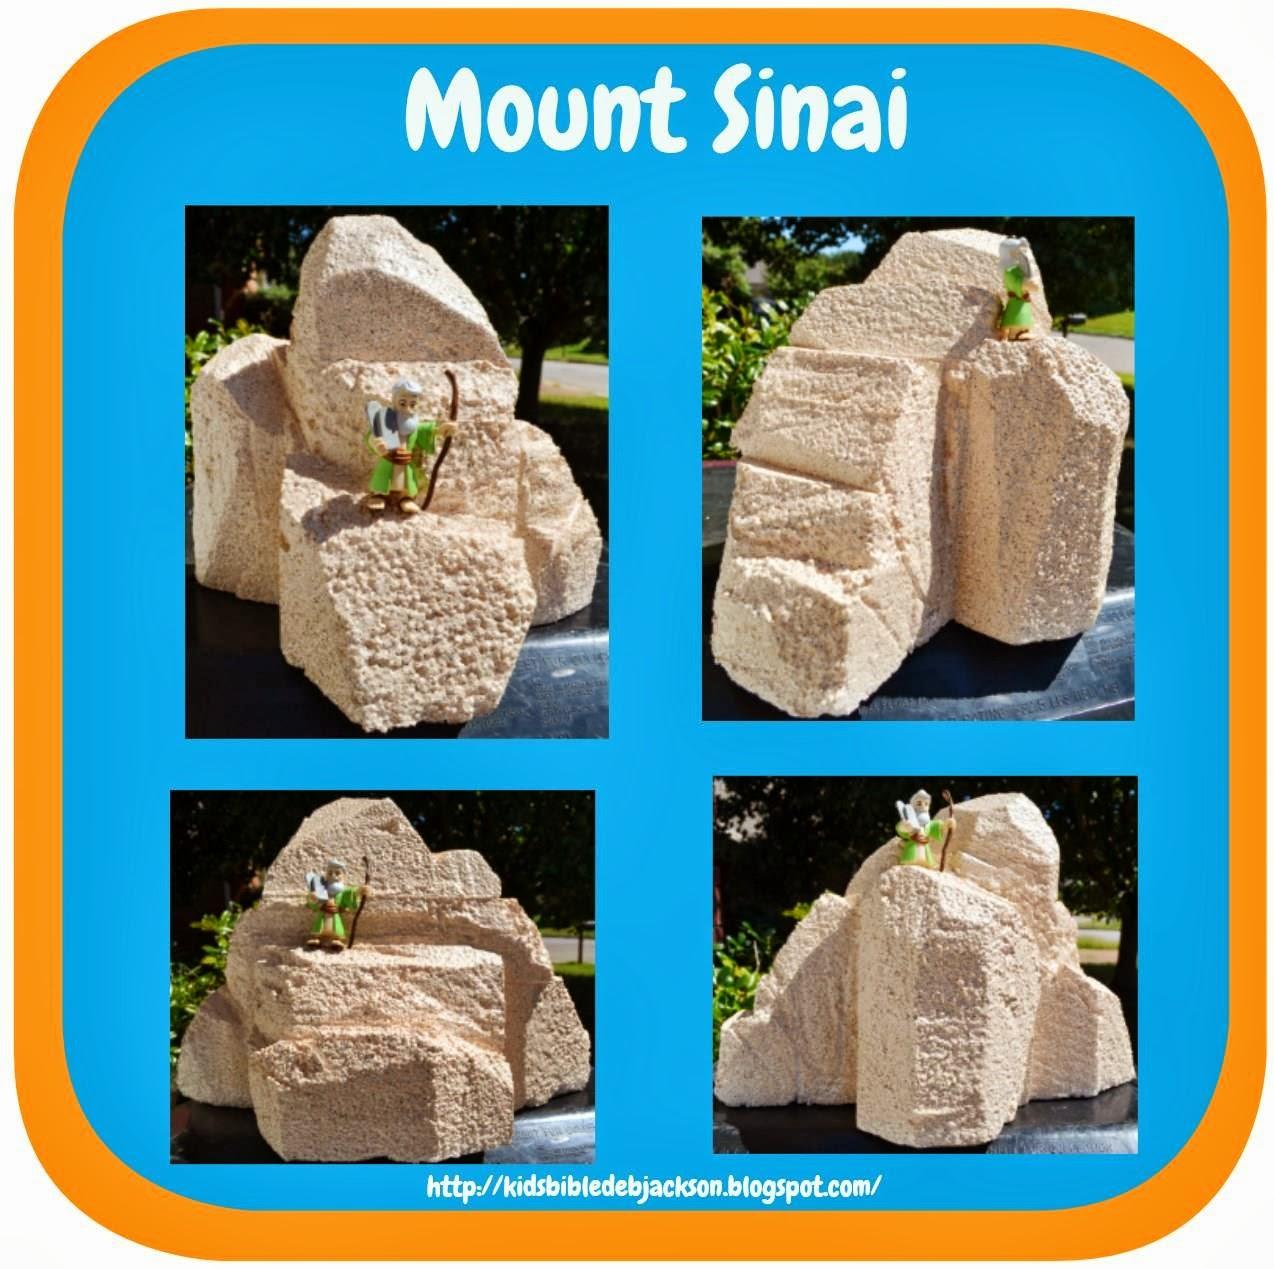 Make Your Own Mt. Sinai visual!